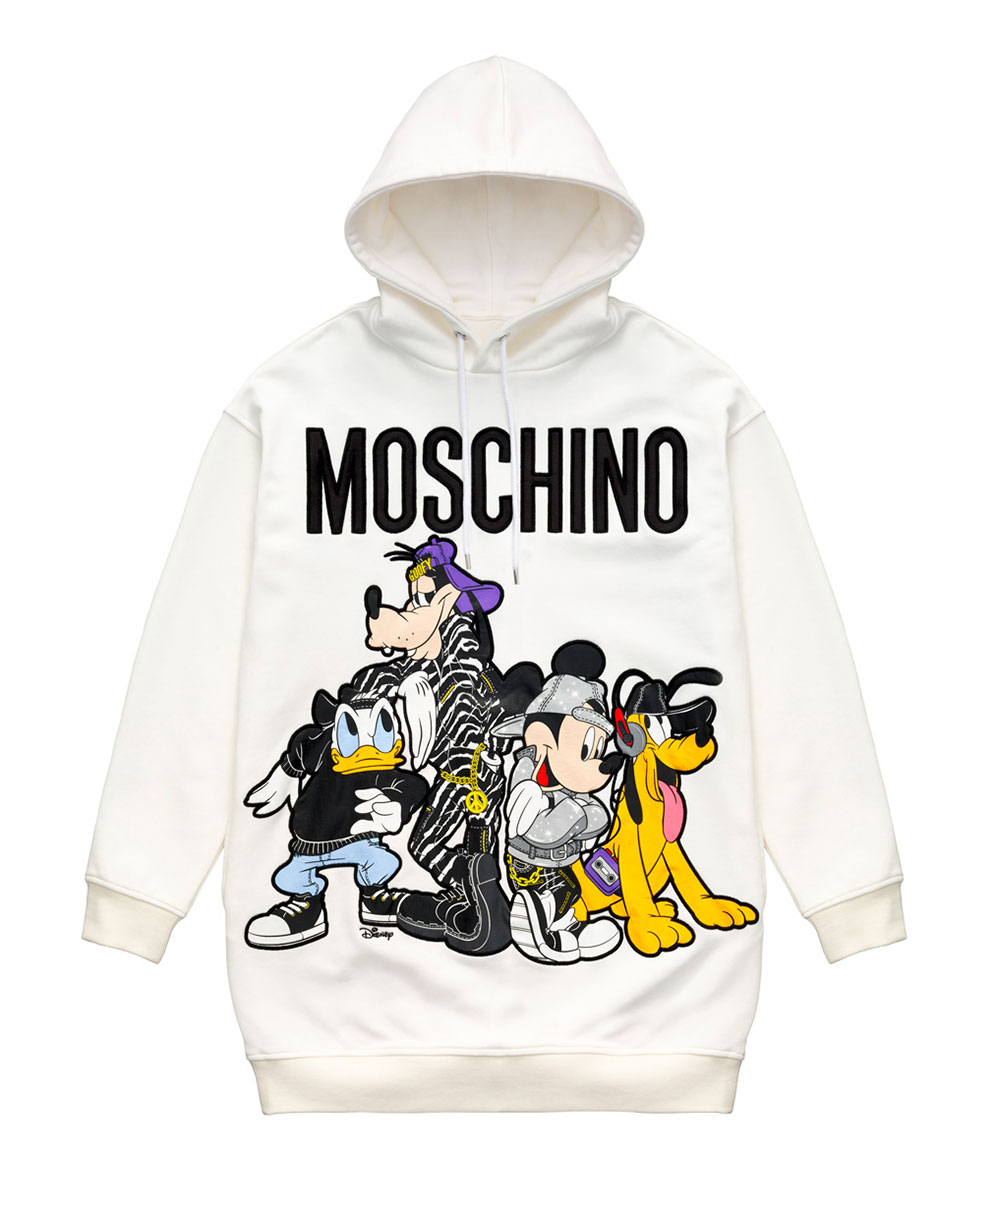 Vit sweatshirt med Disney-firgurer H&M x Moschino